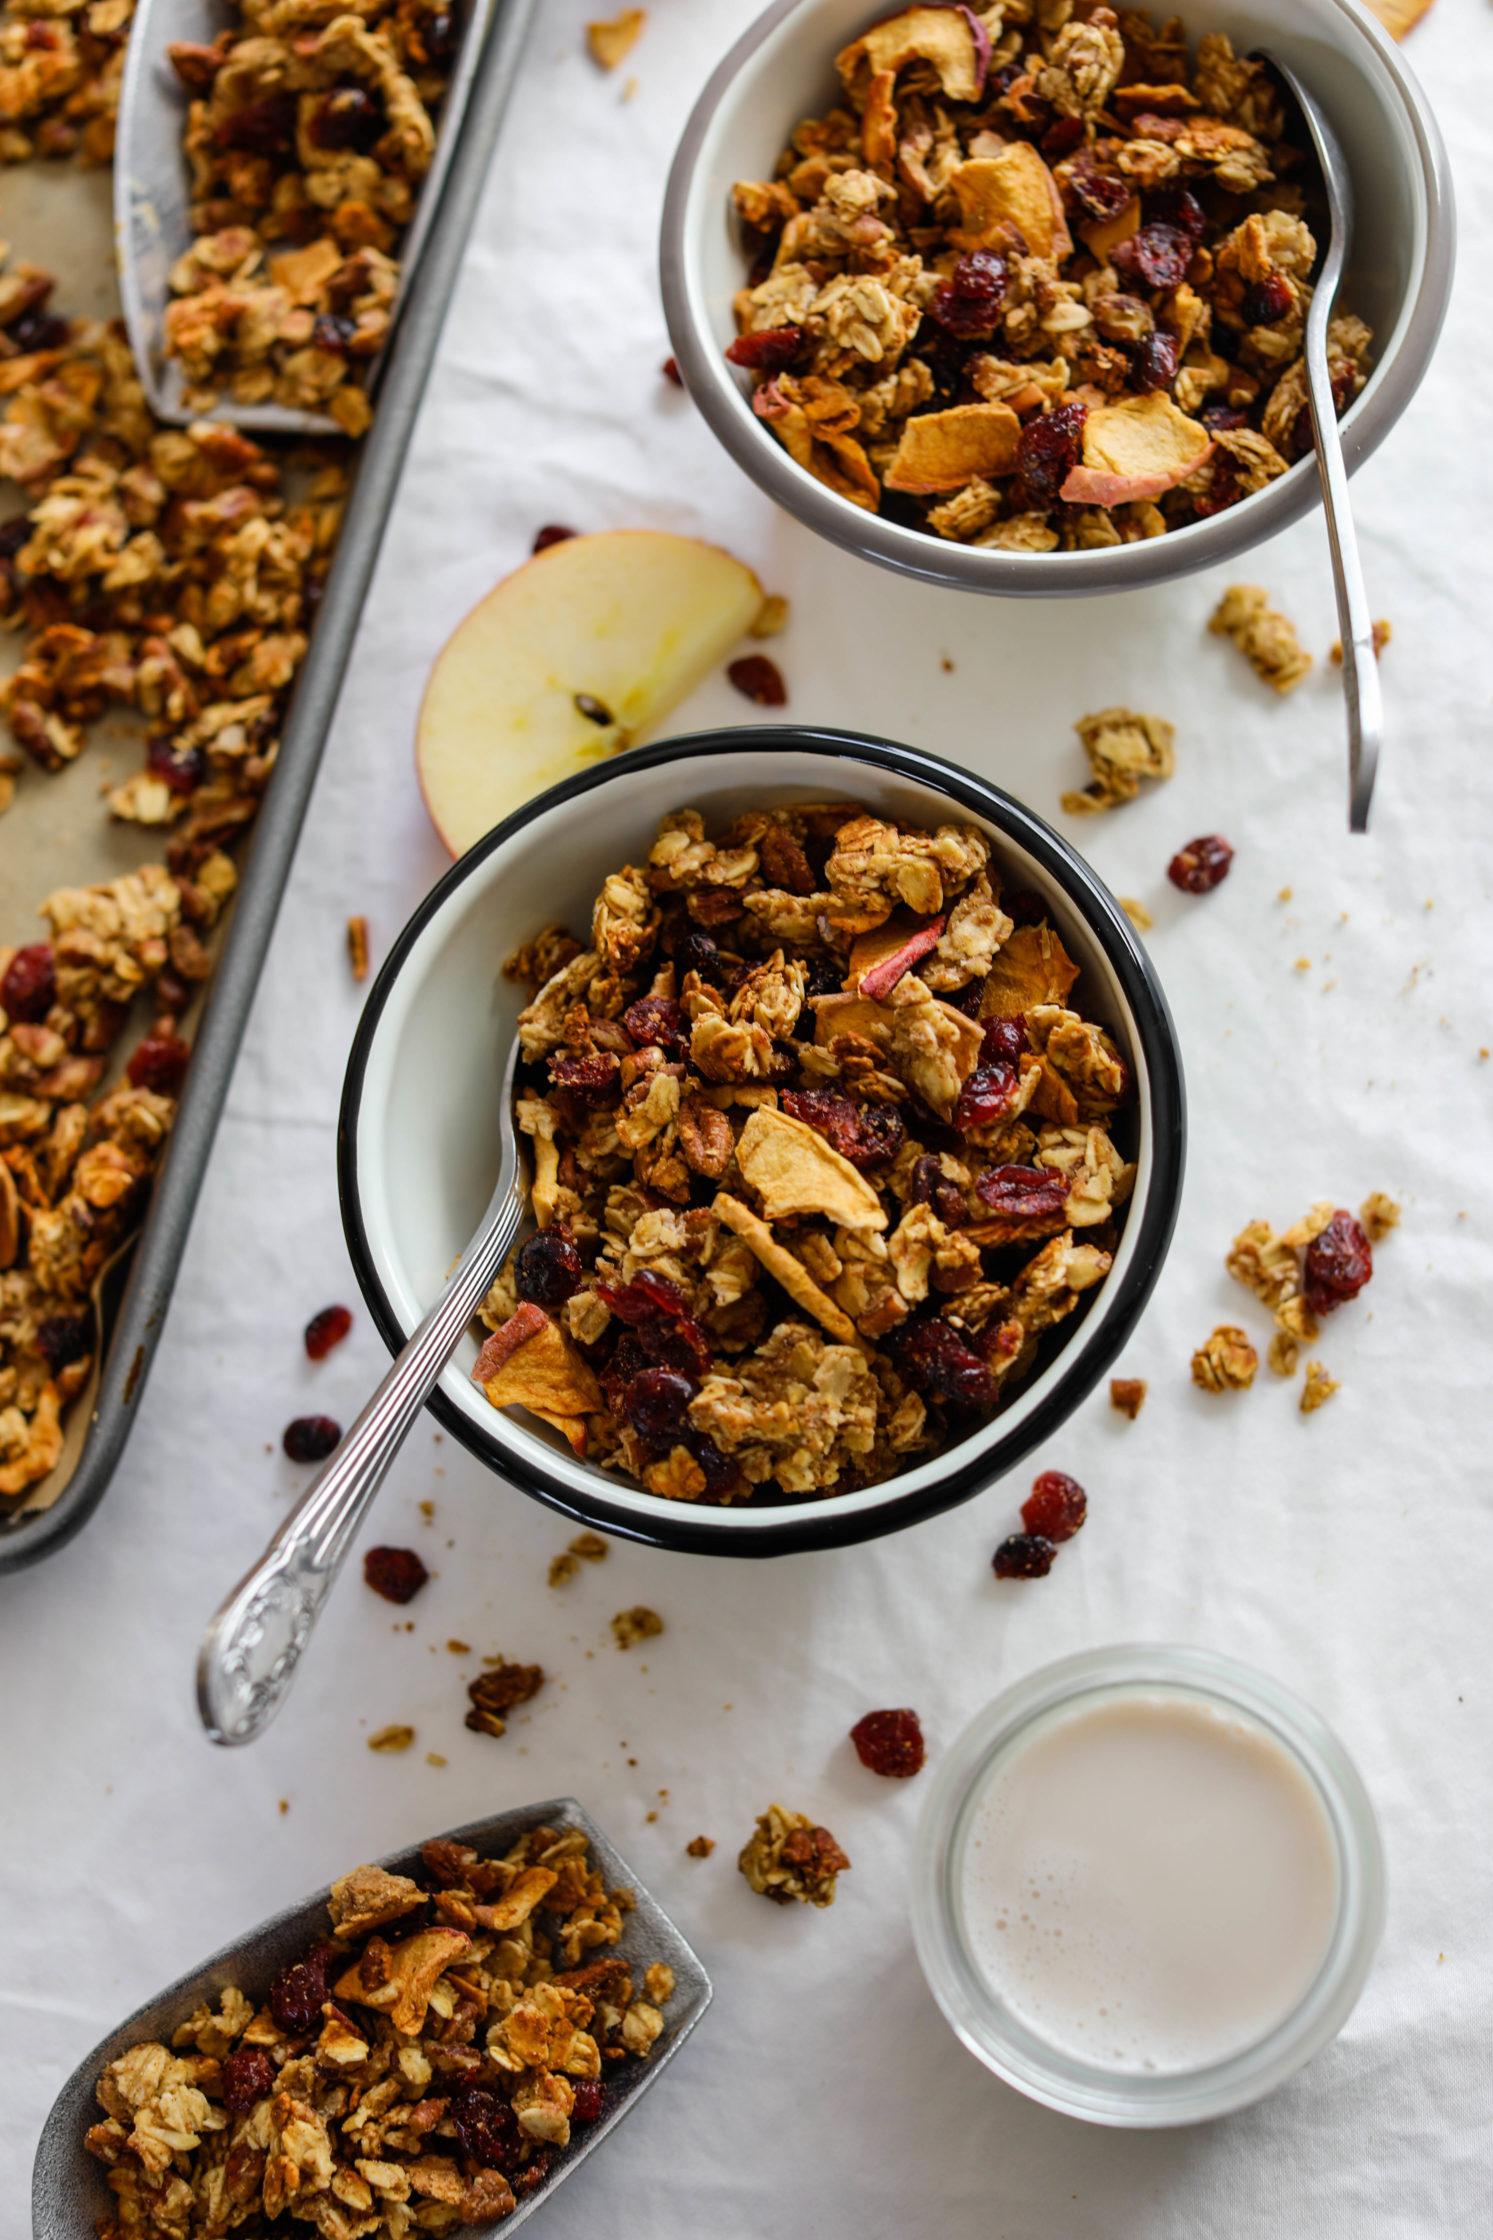 Apple Cranberry Pecan Granola by Flora & Vino